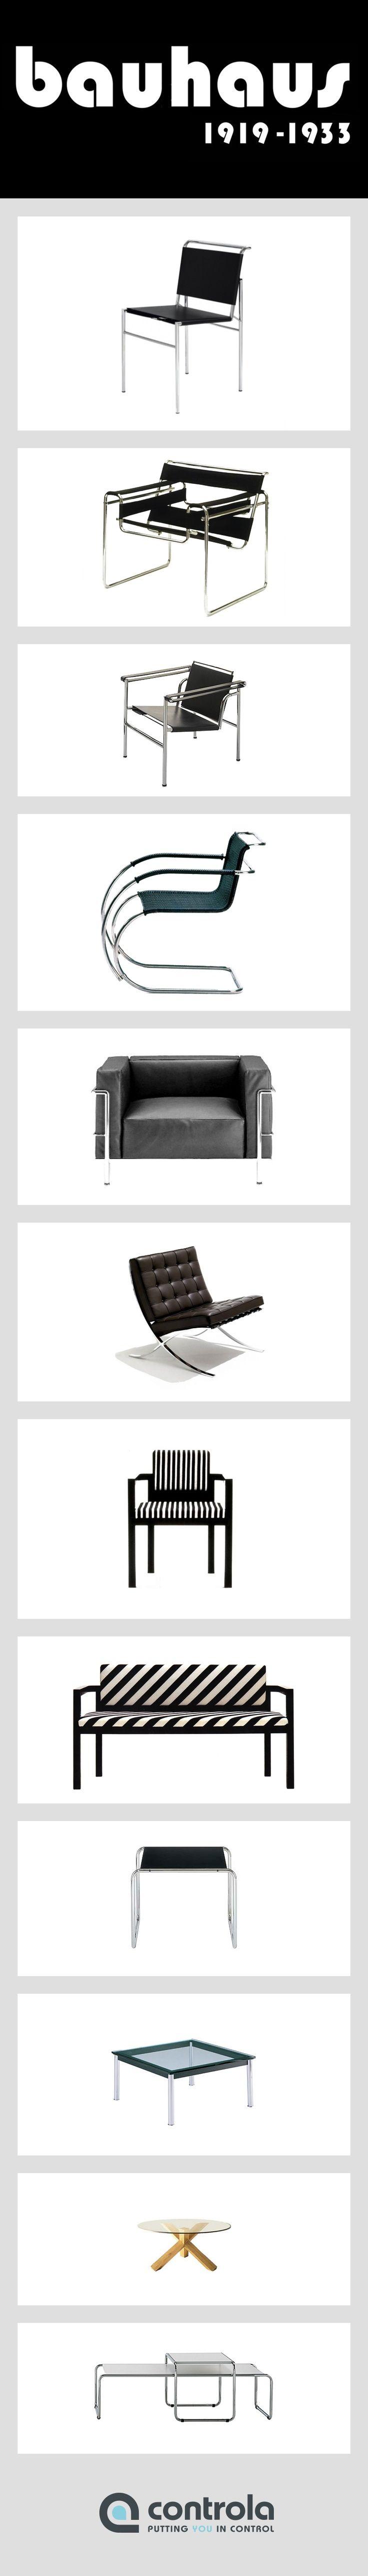 Private Web Design Html Css Training Courses In London Uk Bauhaus Furniture Bauhaus Design Modern Industrial Furniture